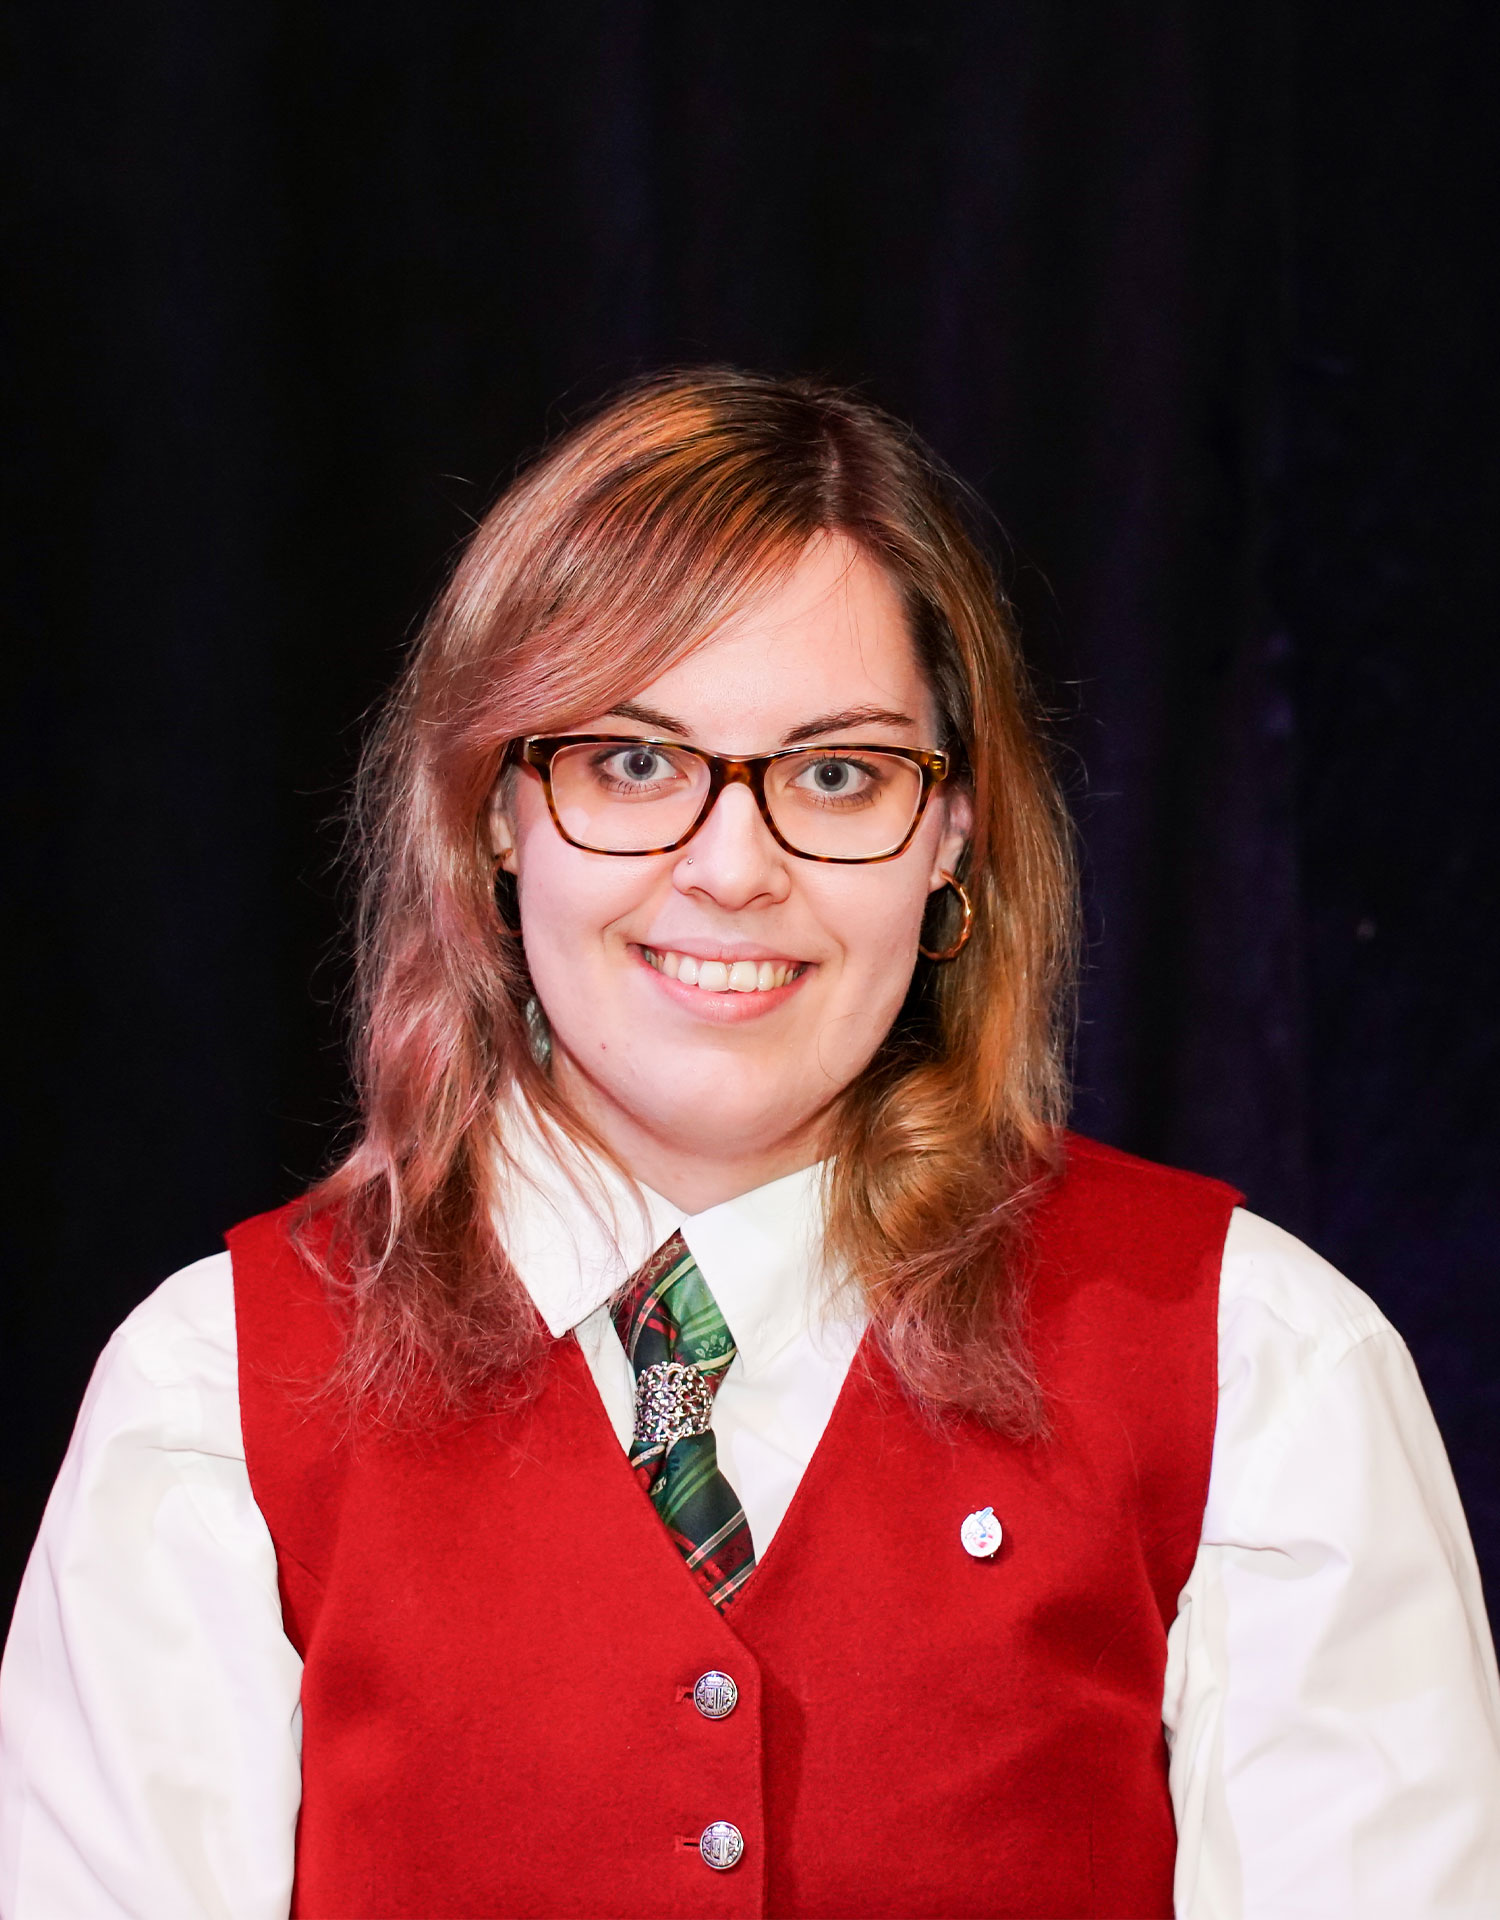 Christina-Litzlbauer